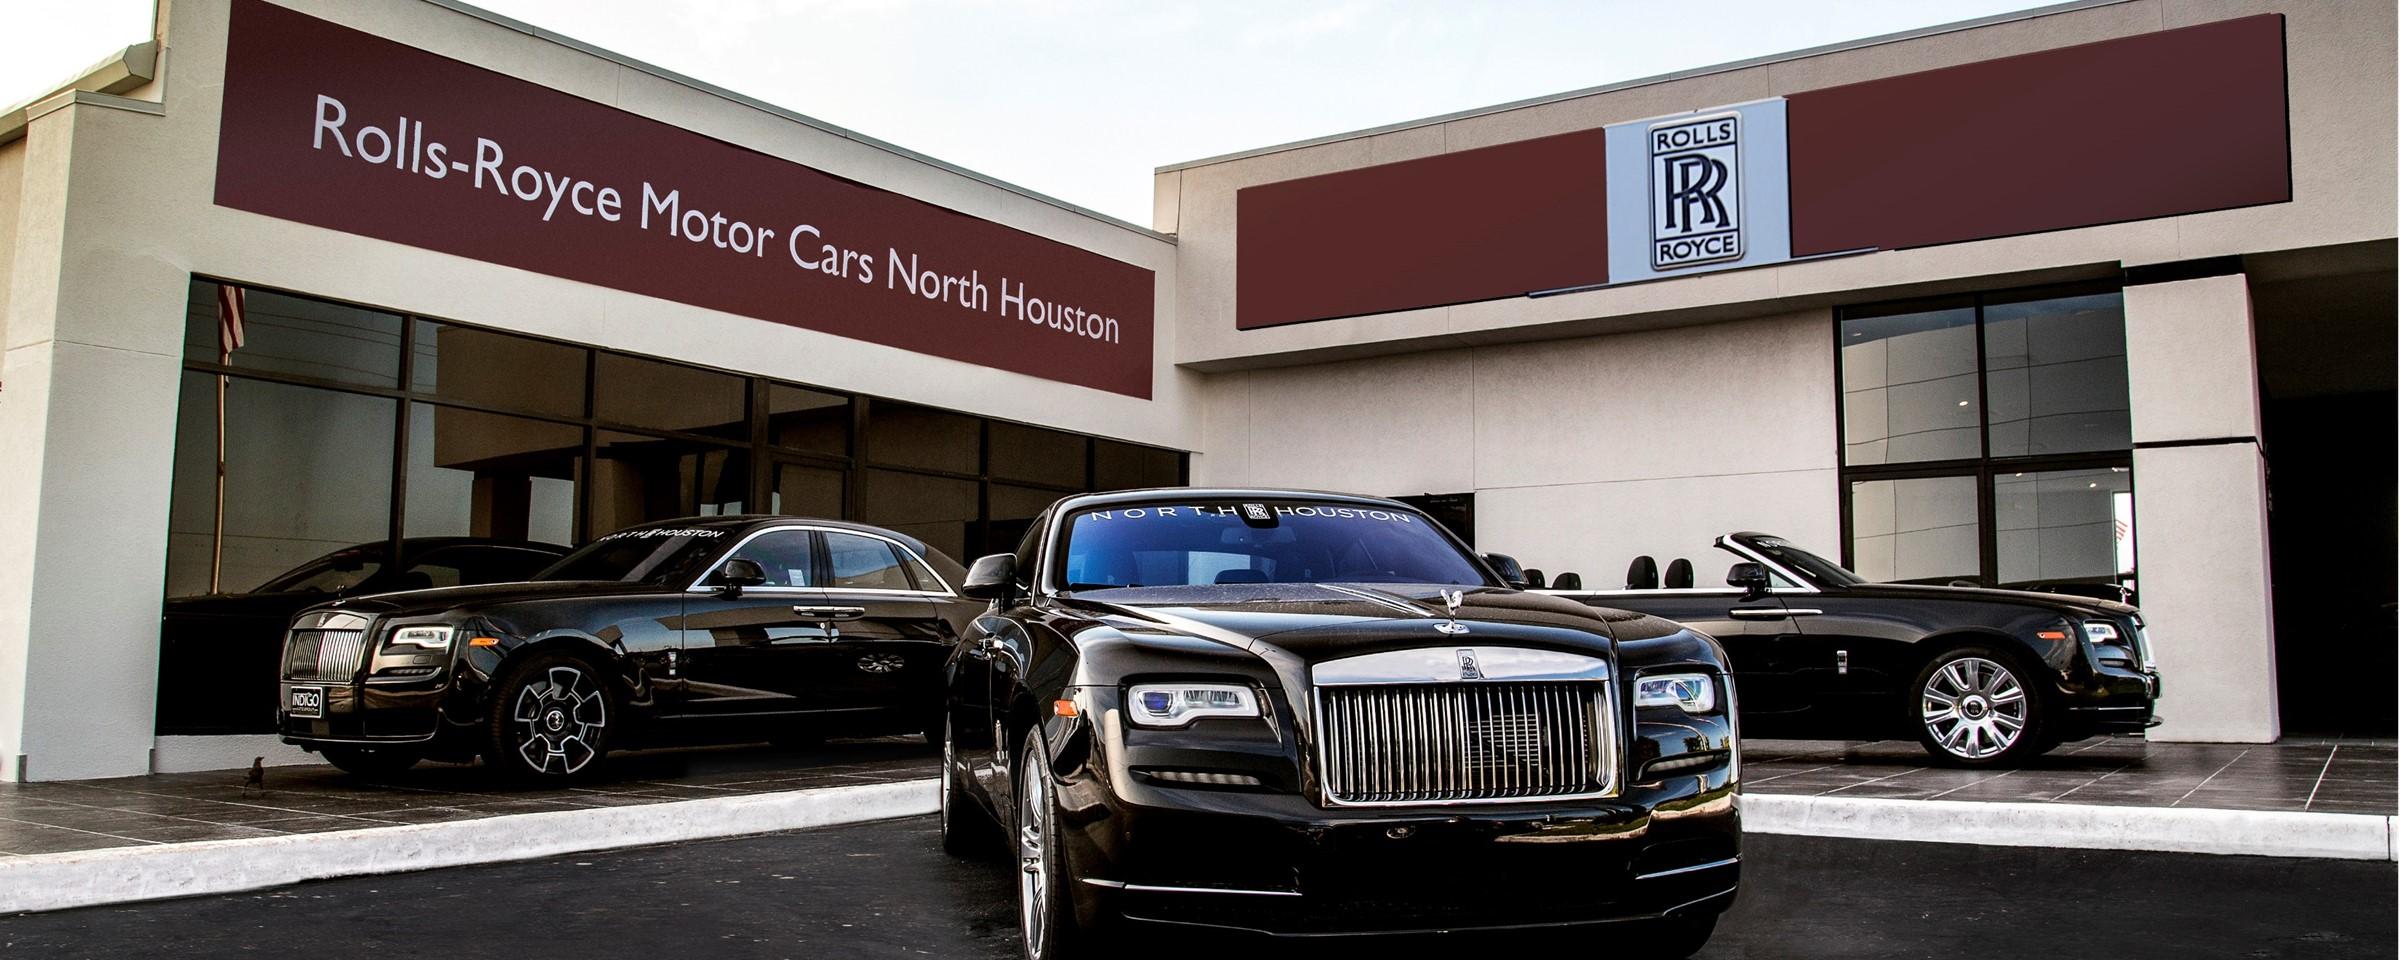 Now Open Rolls Royce Motor Cars North Houston Rolls Royce Rancho